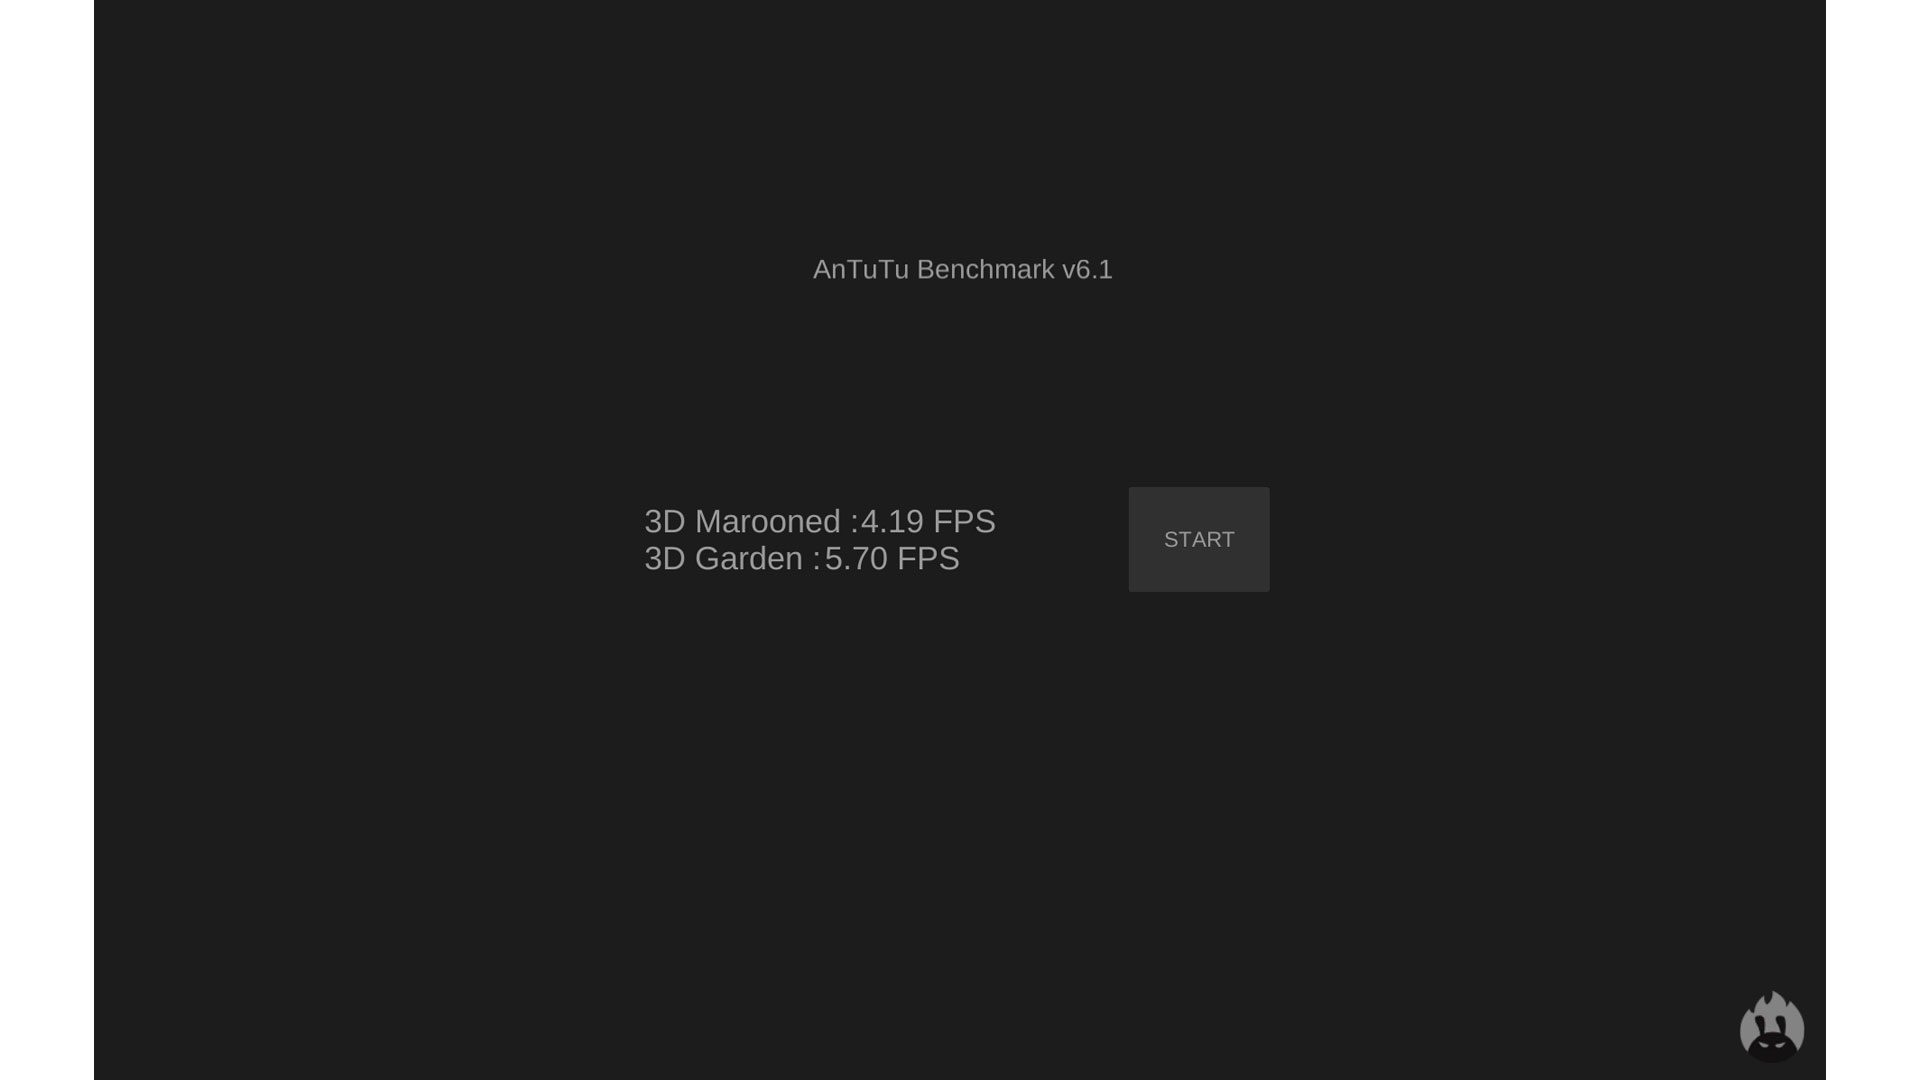 Huawei-MediaPad-M3-Lite_Benchmark-1